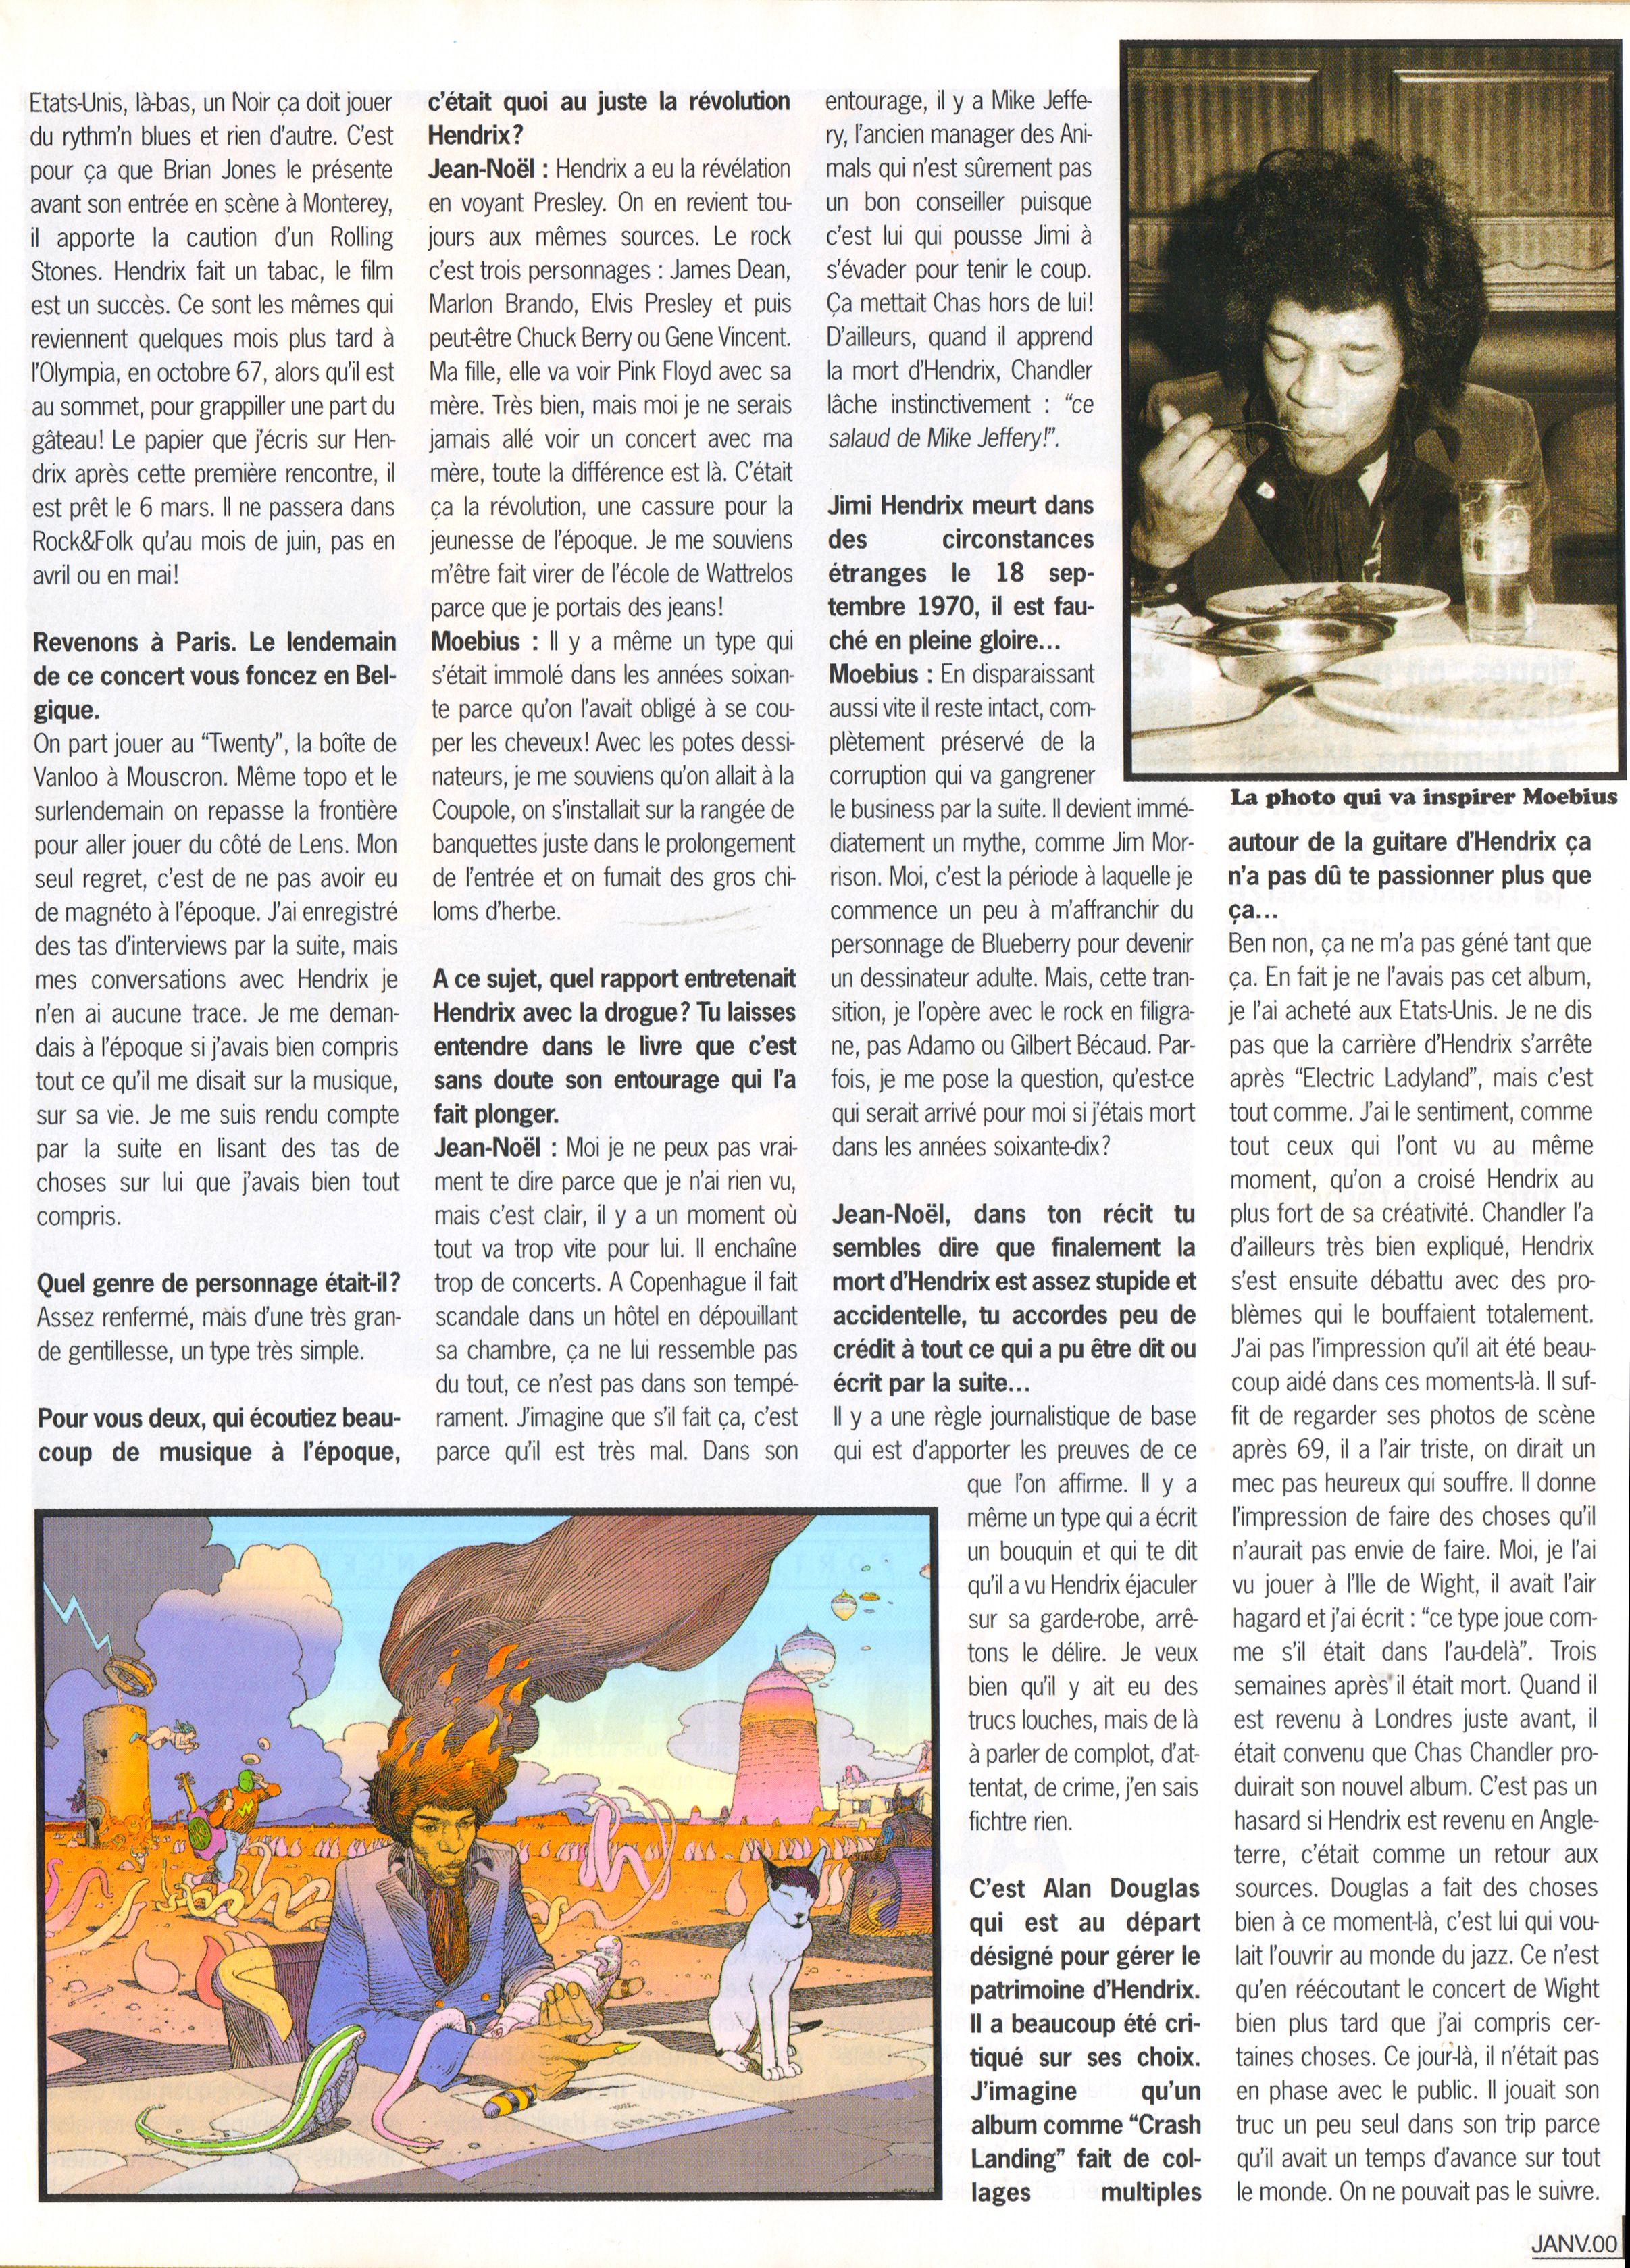 Magazines Français 1989 - 2014 GuitaretBassJanvier2000Page29